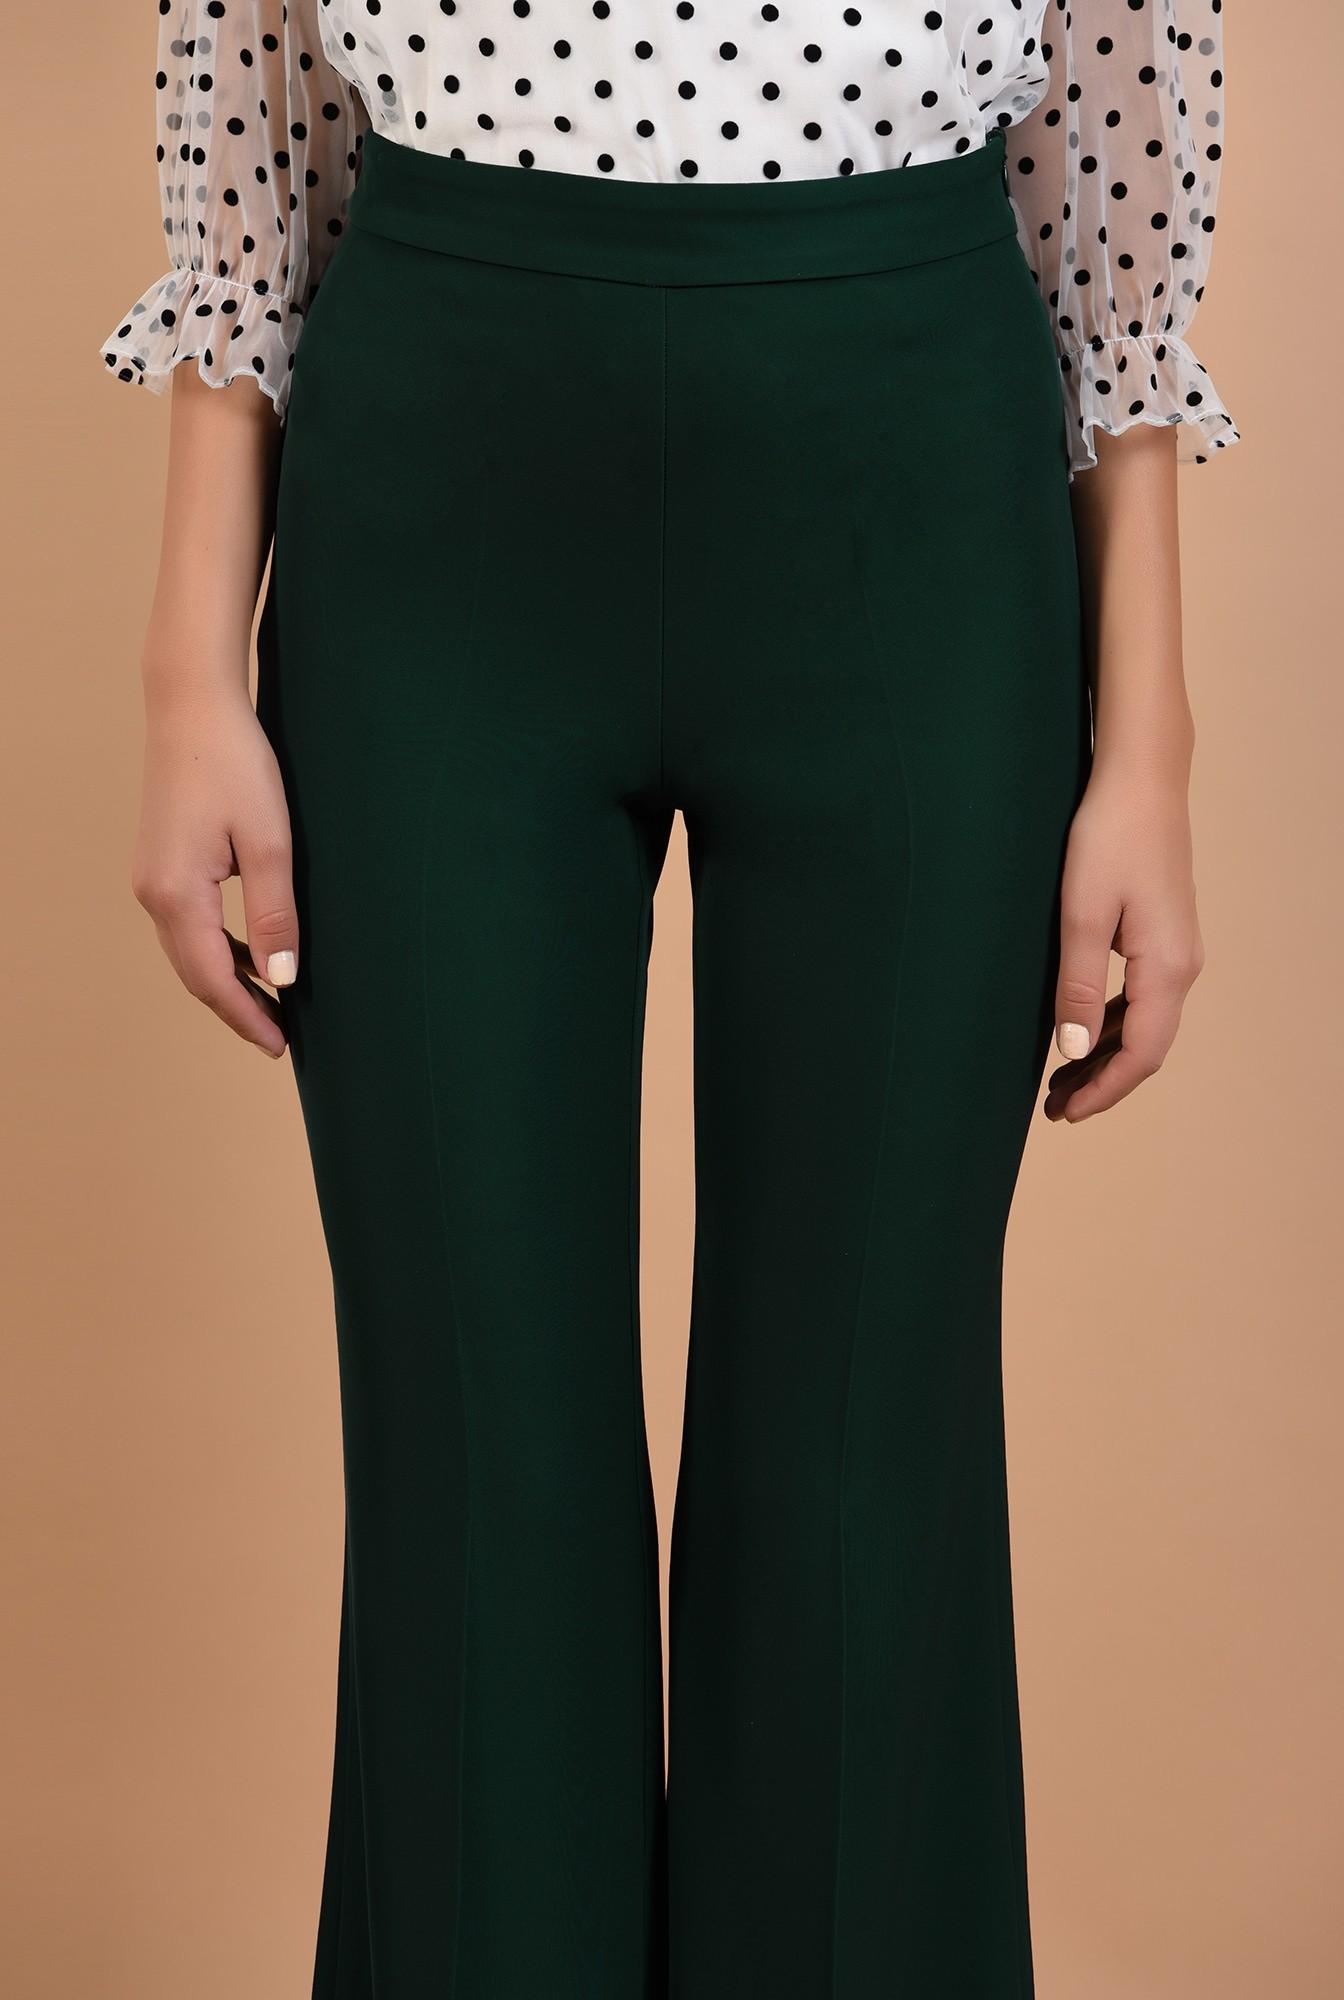 2 - 360 - pantaloni evazati, lungi, croi la dunga, verde inchis, Poema